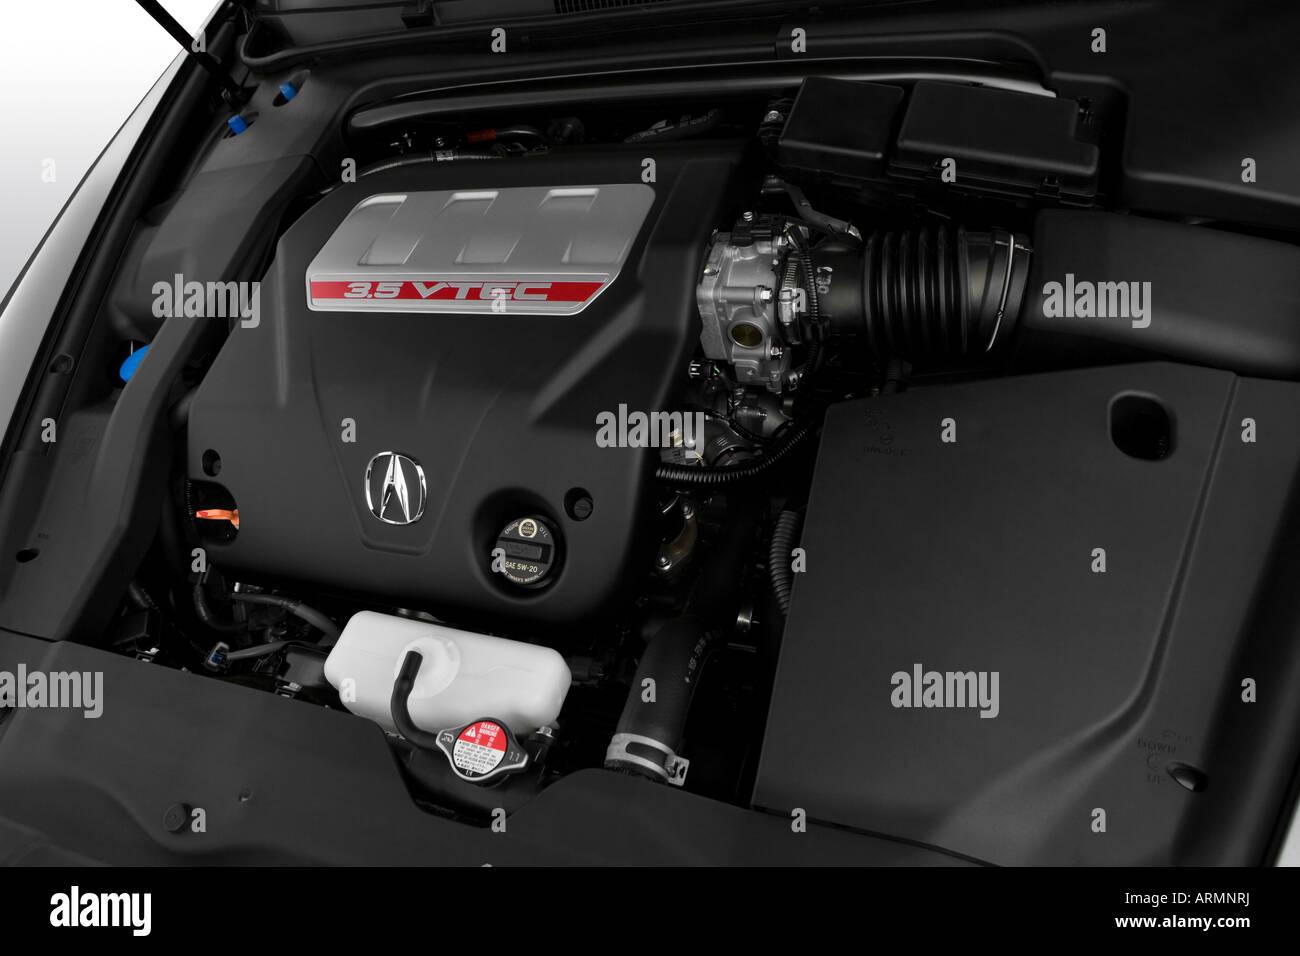 2008 Acura Tl Type S In Beige Engine Stock Photo Alamy